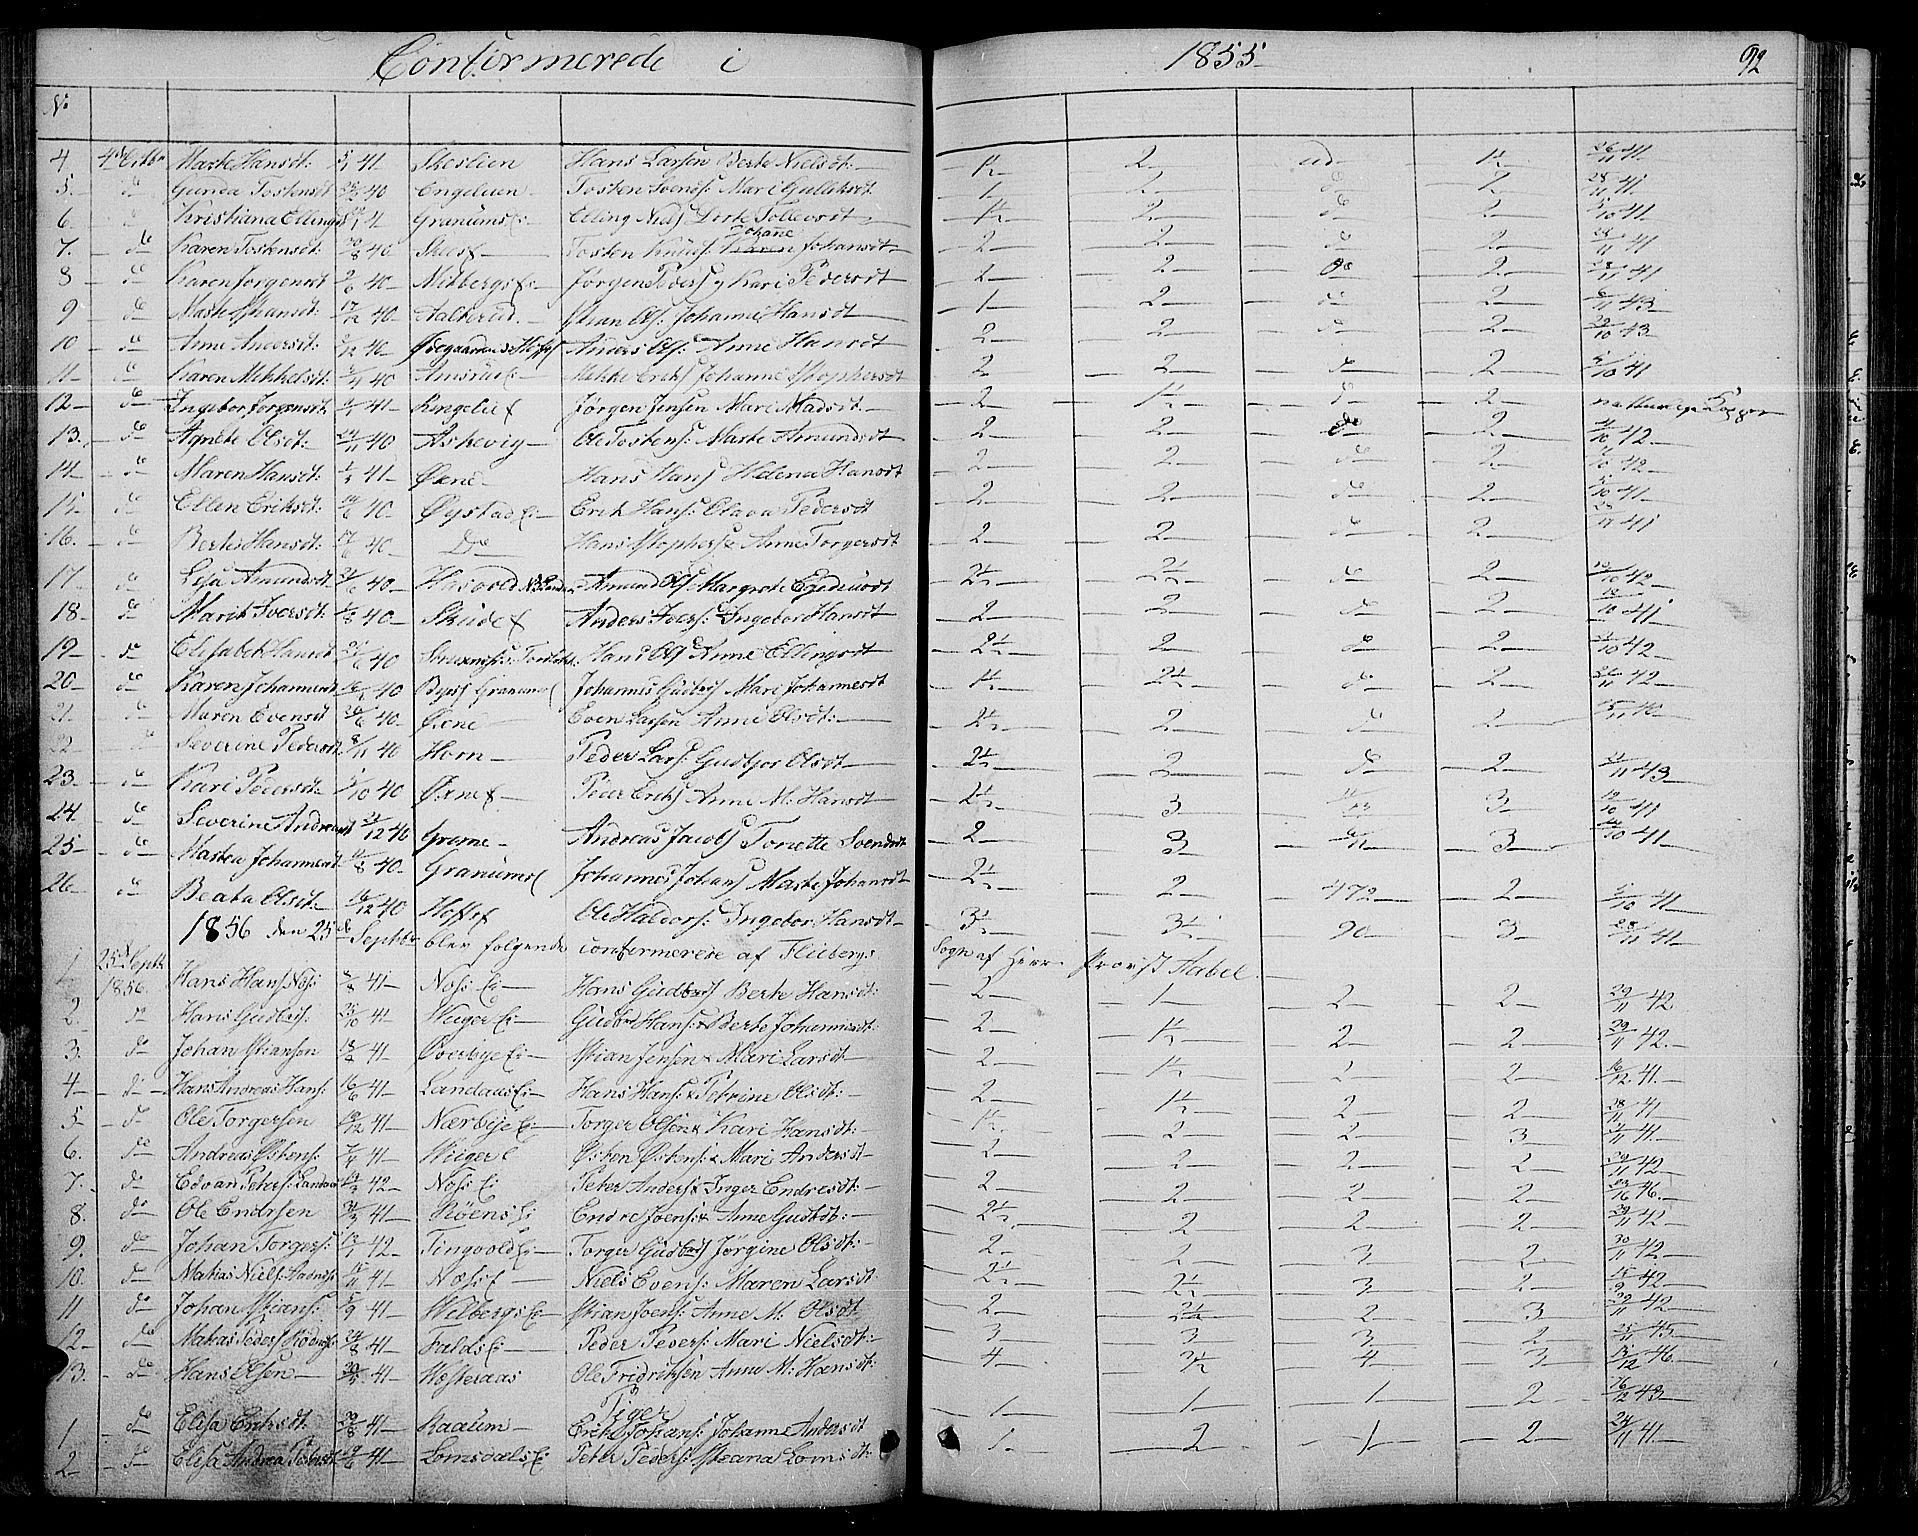 SAH, Søndre Land prestekontor, L/L0001: Klokkerbok nr. 1, 1849-1883, s. 92